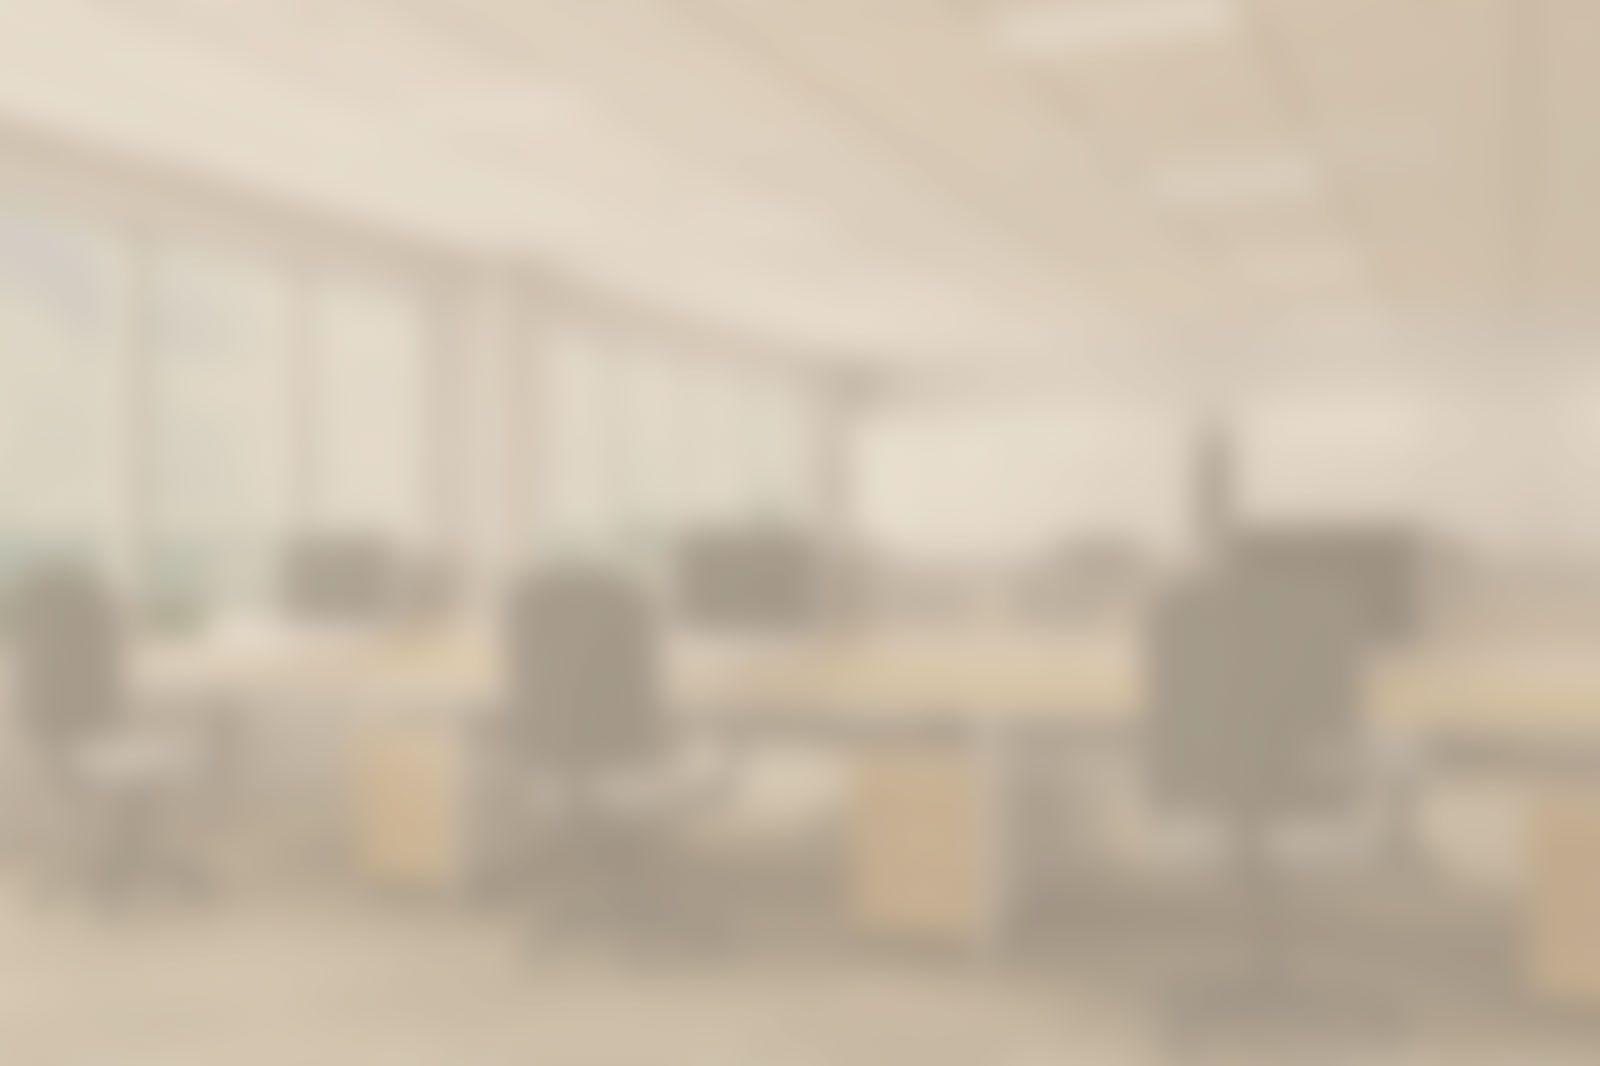 blurred-parallax4.jpg